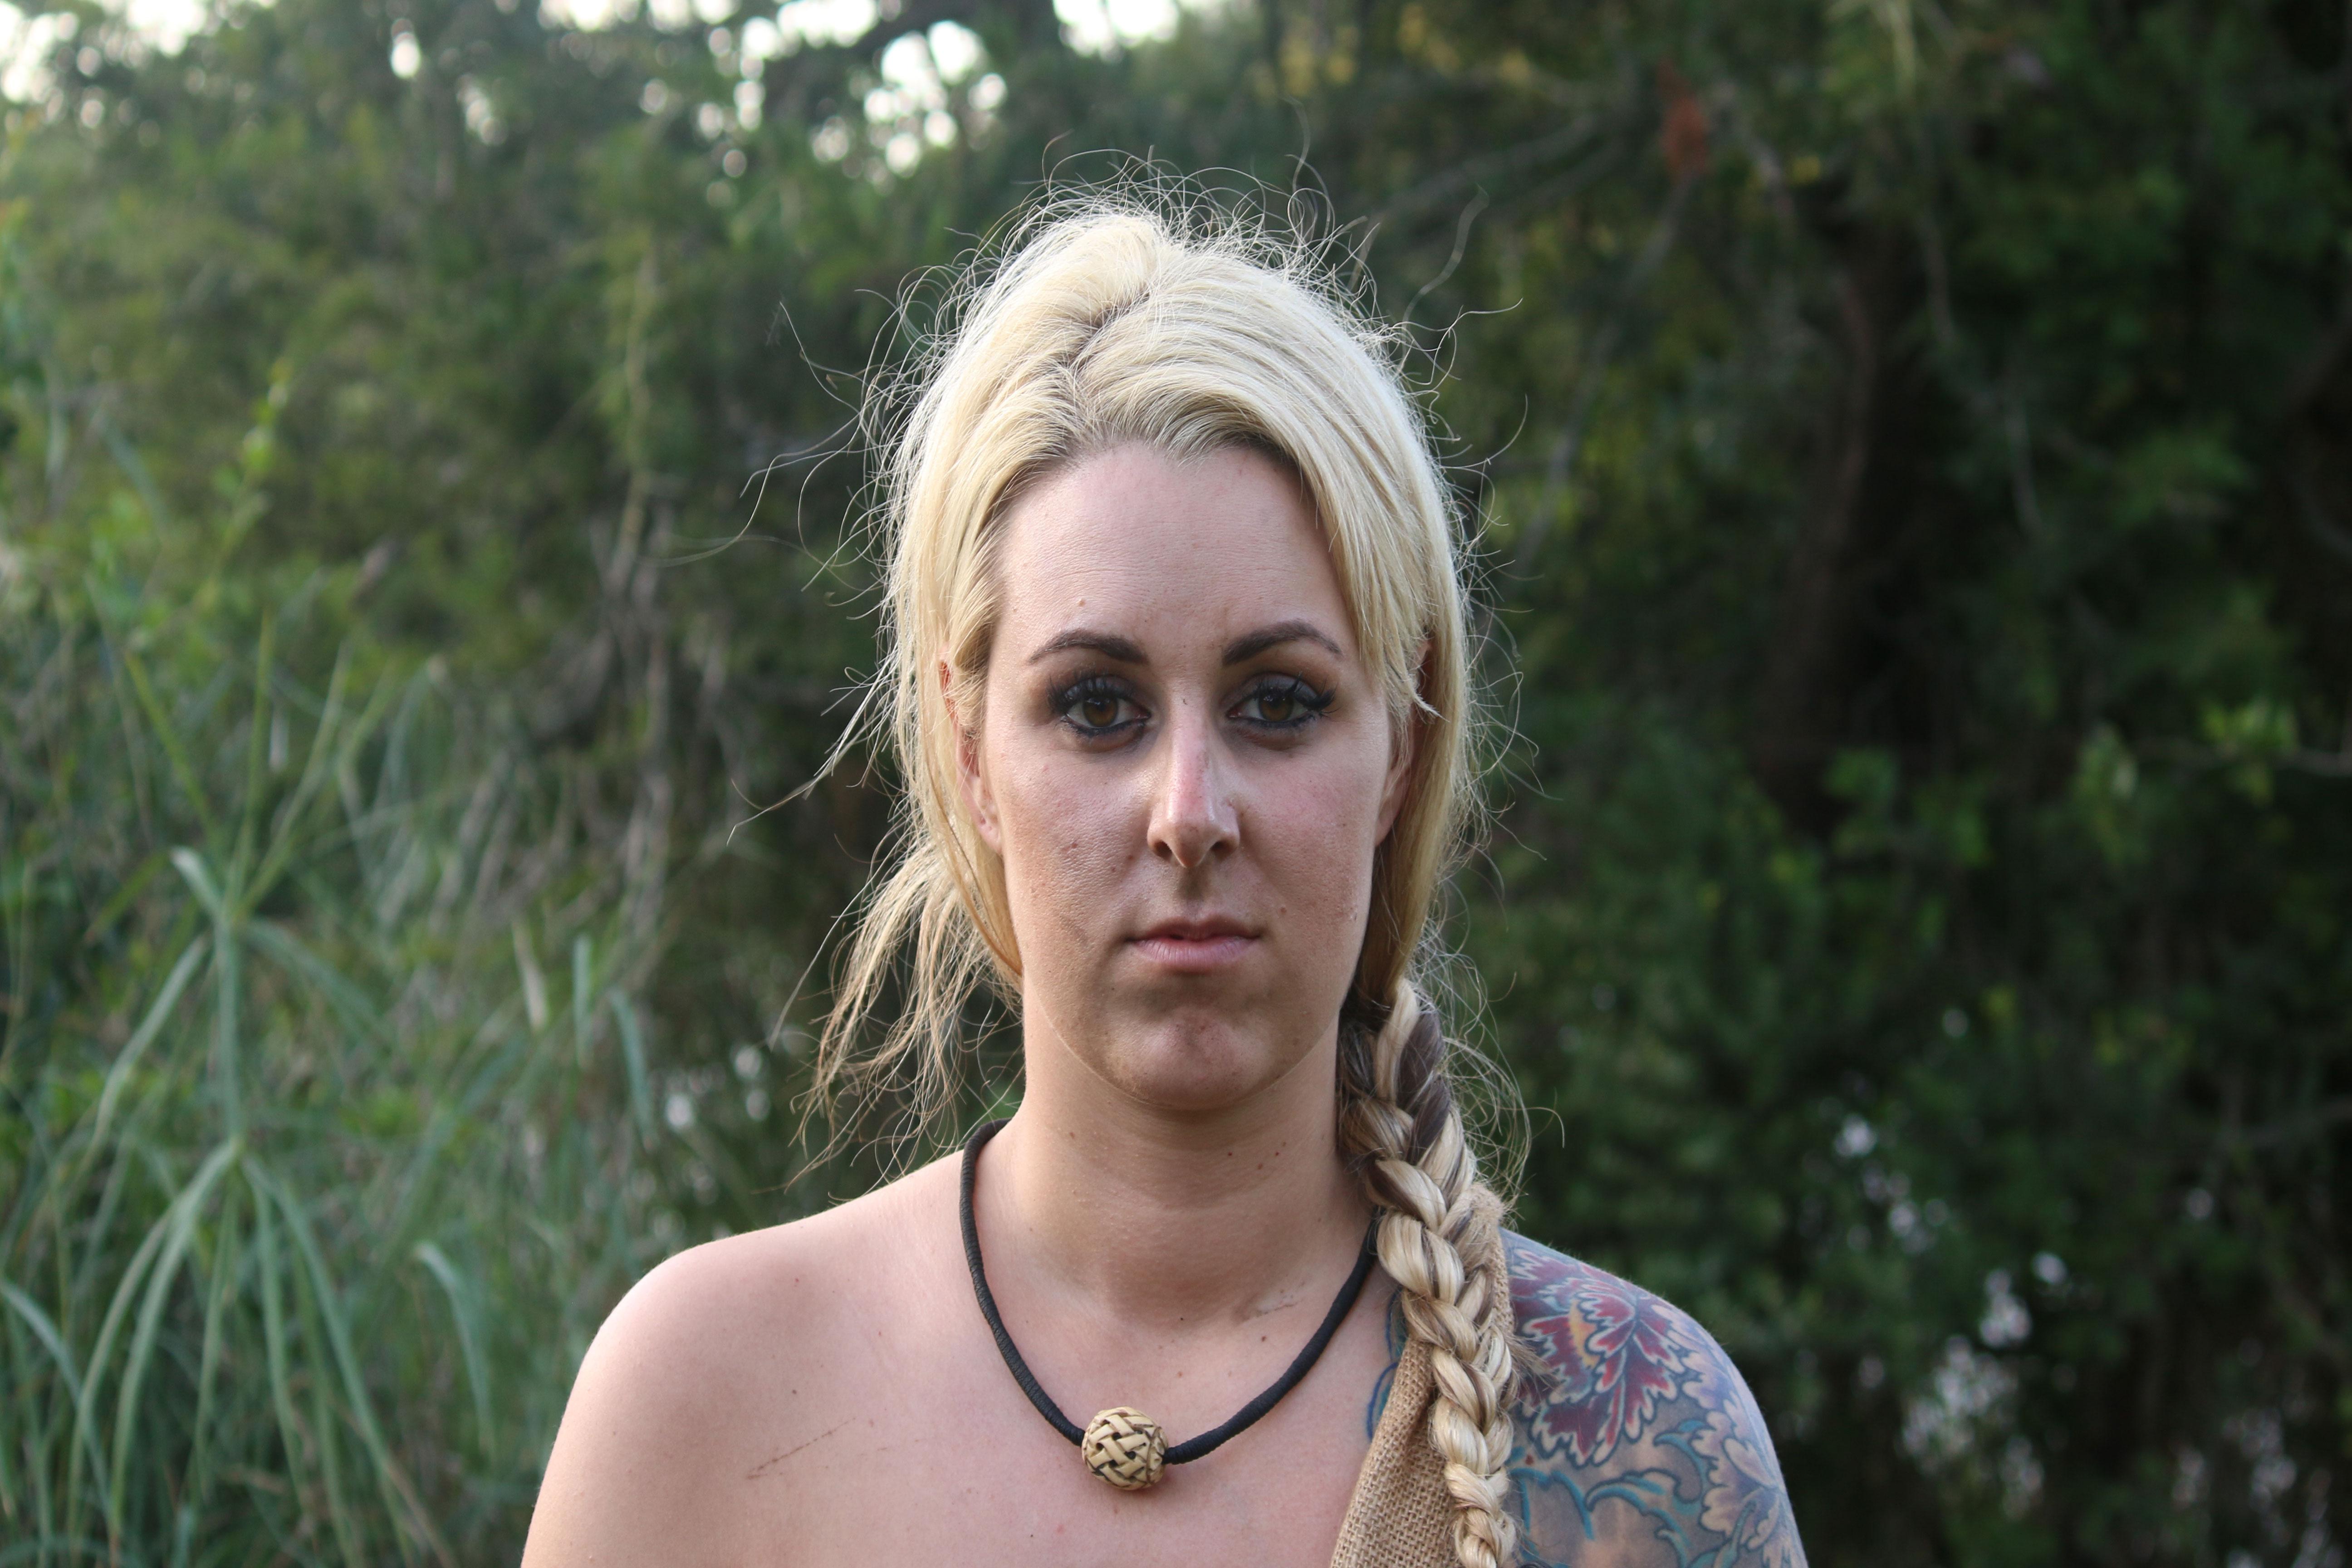 debbie beal bikini photos